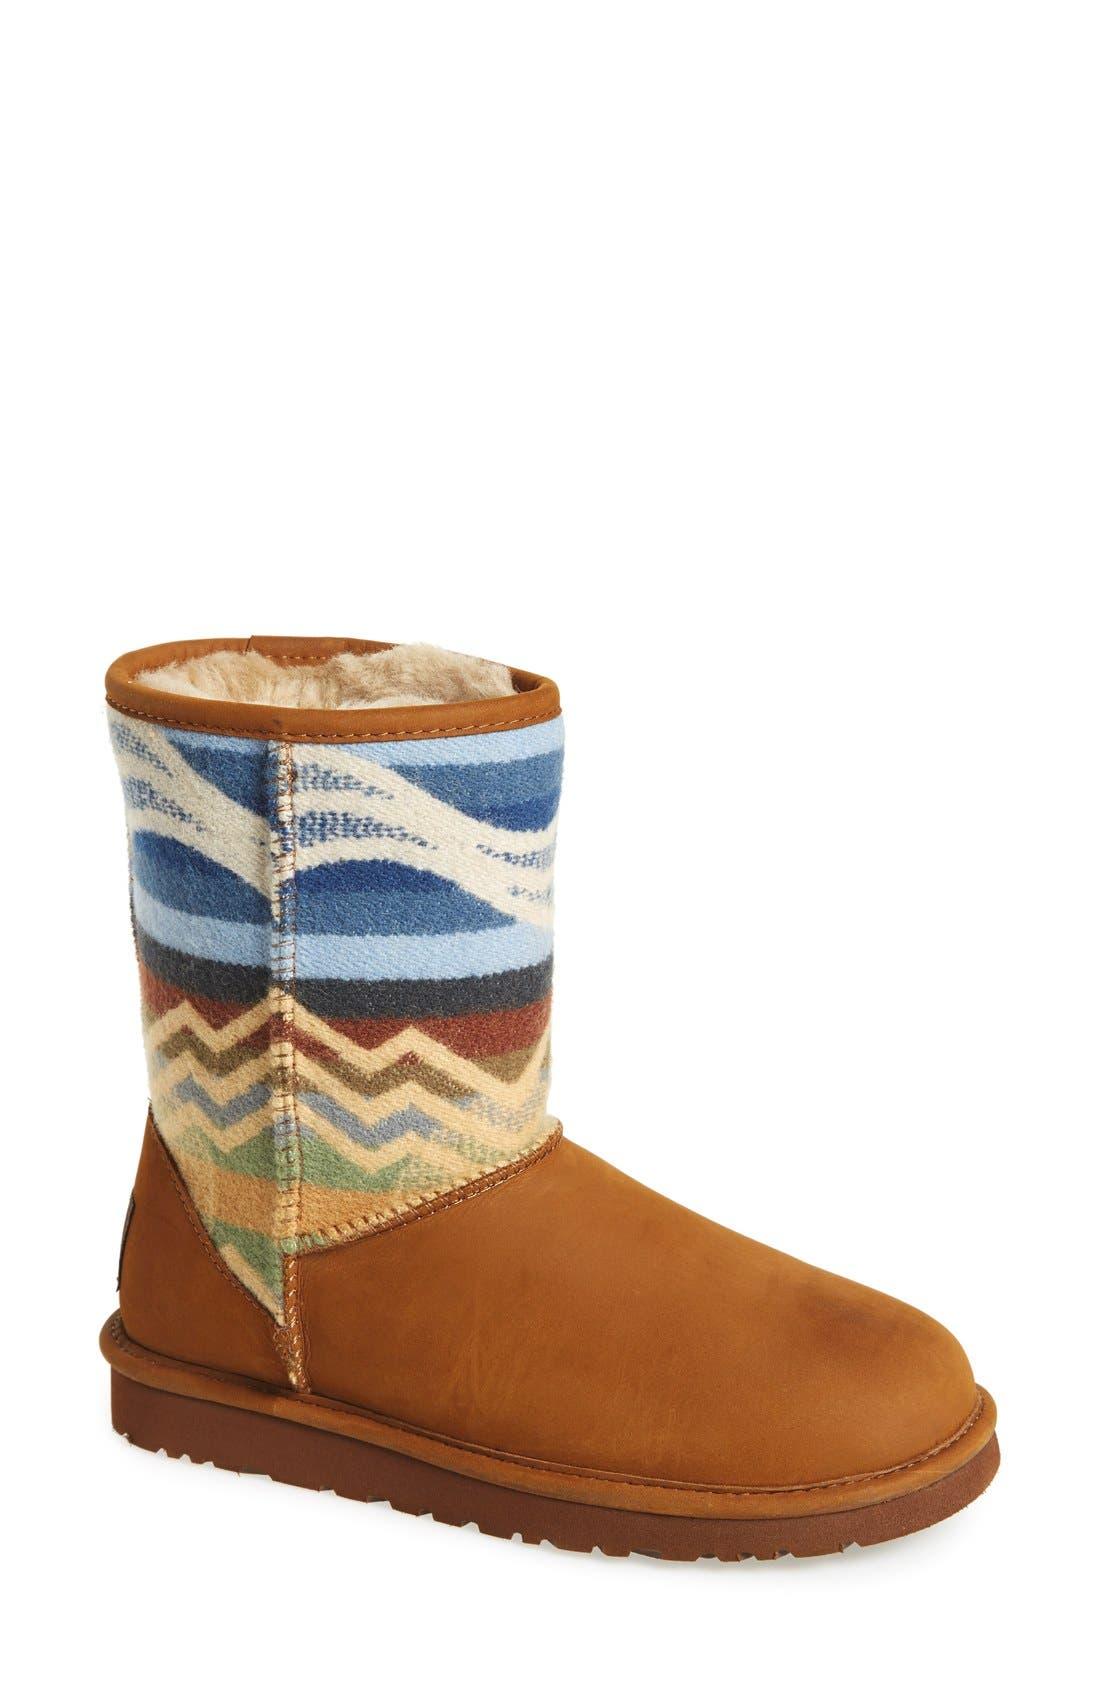 Alternate Image 1 Selected - UGG® 'Classic ShortPendleton'Boot (Women)